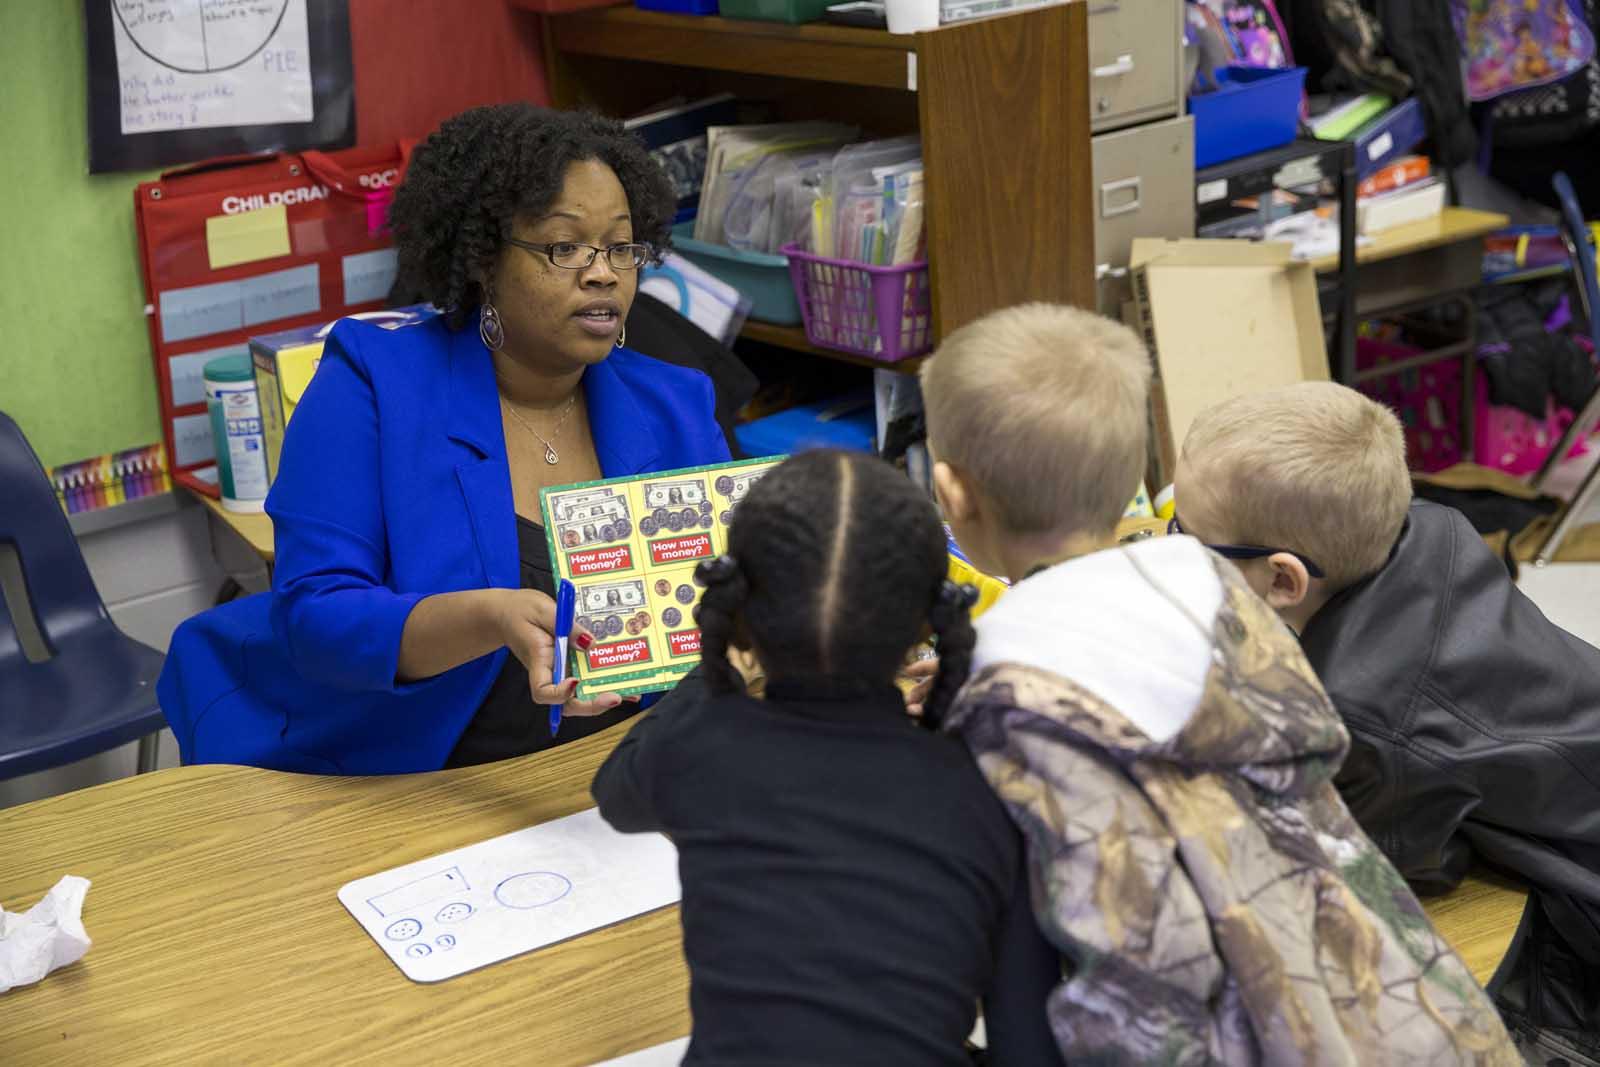 Altra Witt teaches in Madison Heights Elementary School